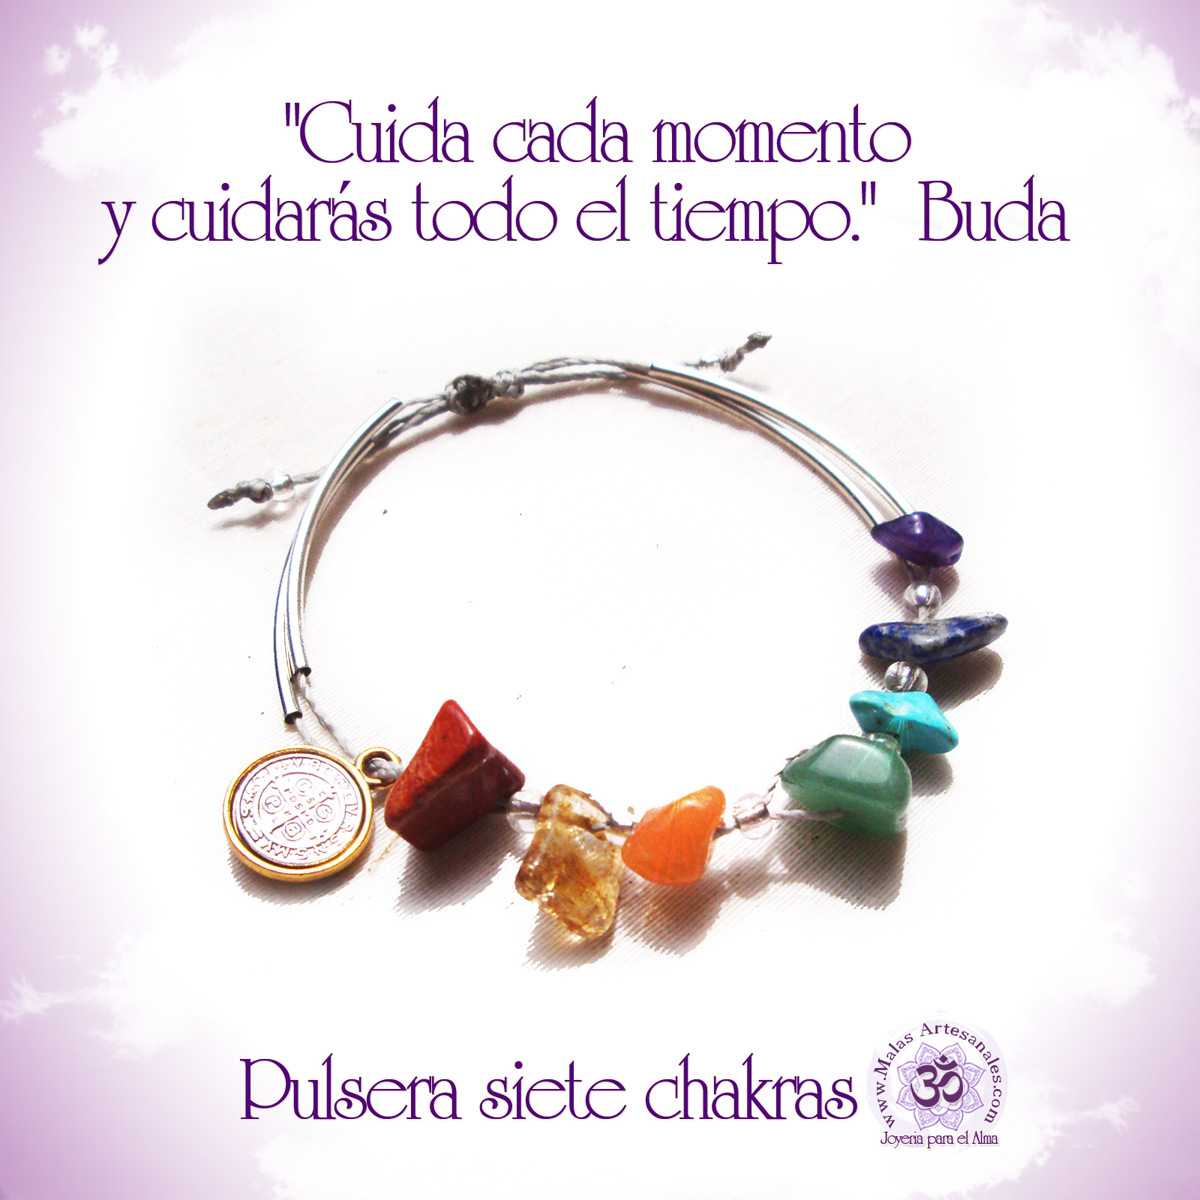 pulsera_espiritual_artesanal_siete_chakras_luz_equilibrio_alegria